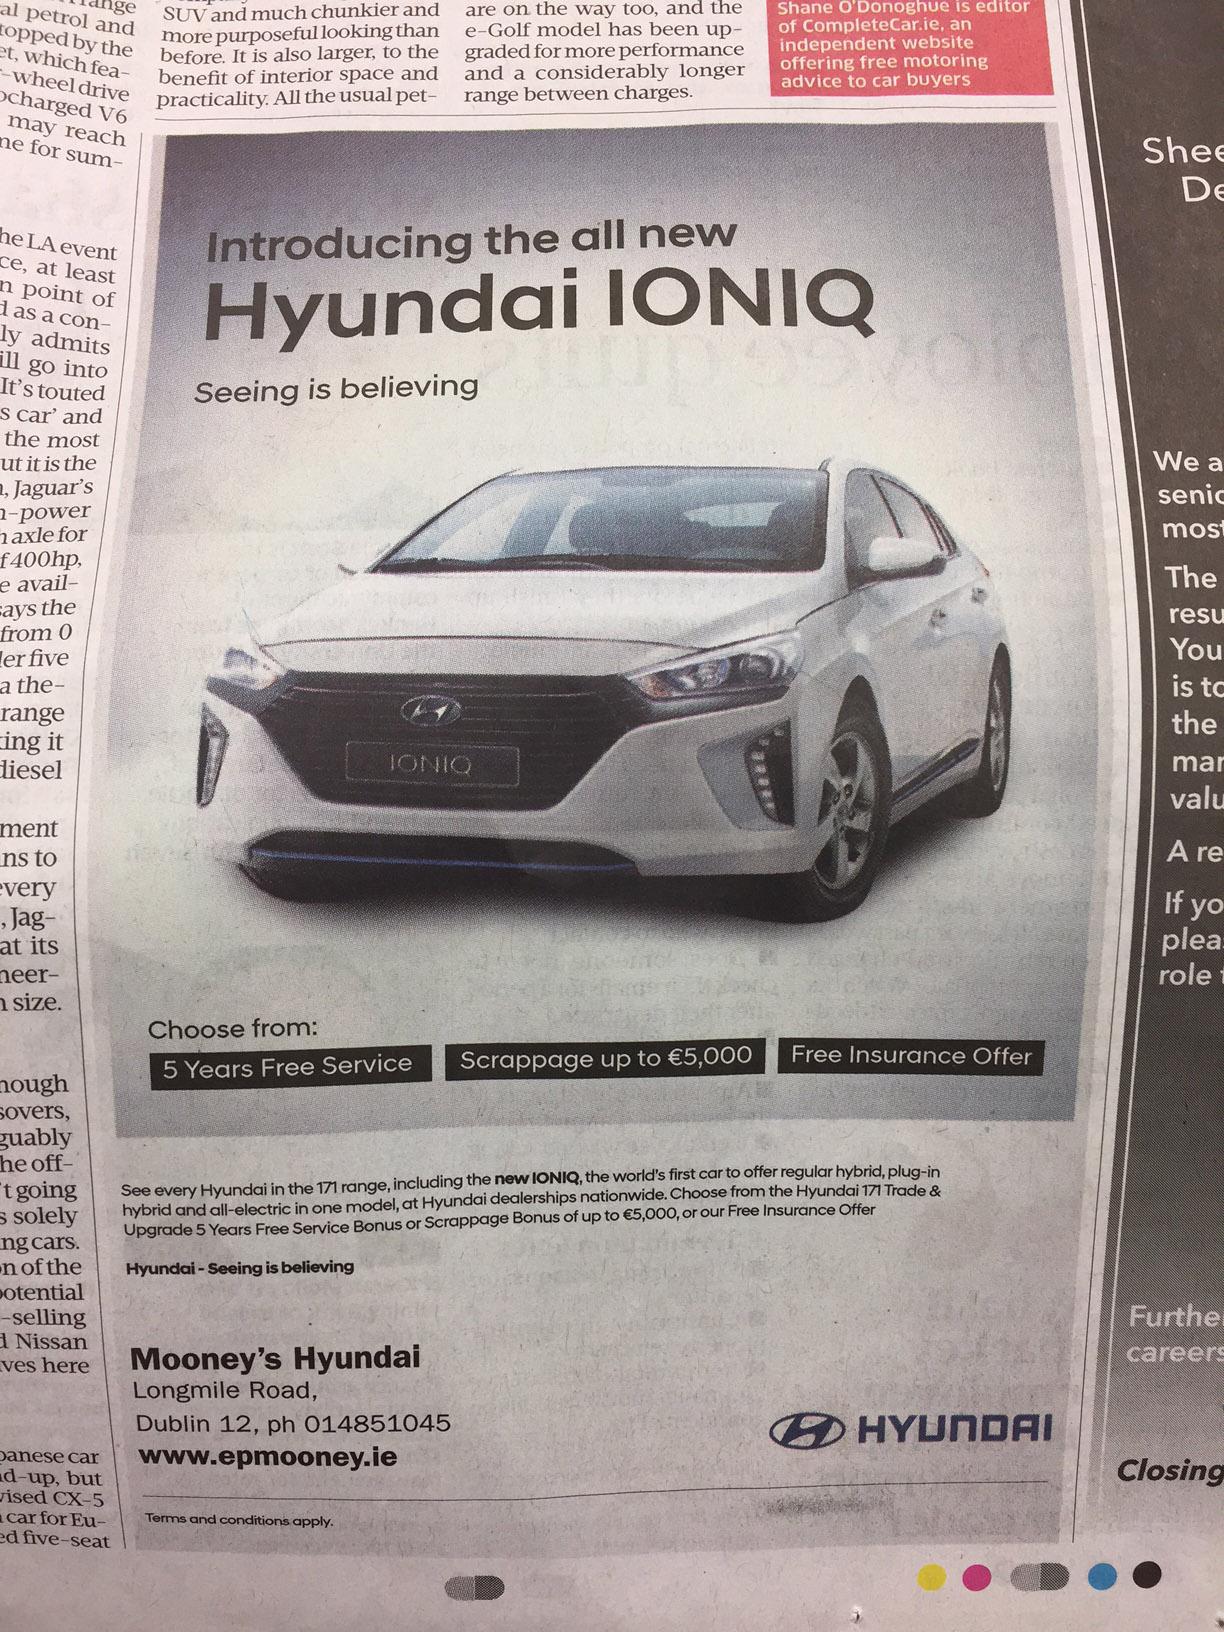 Hyundai – introducing the all new Hyundai IONIQ